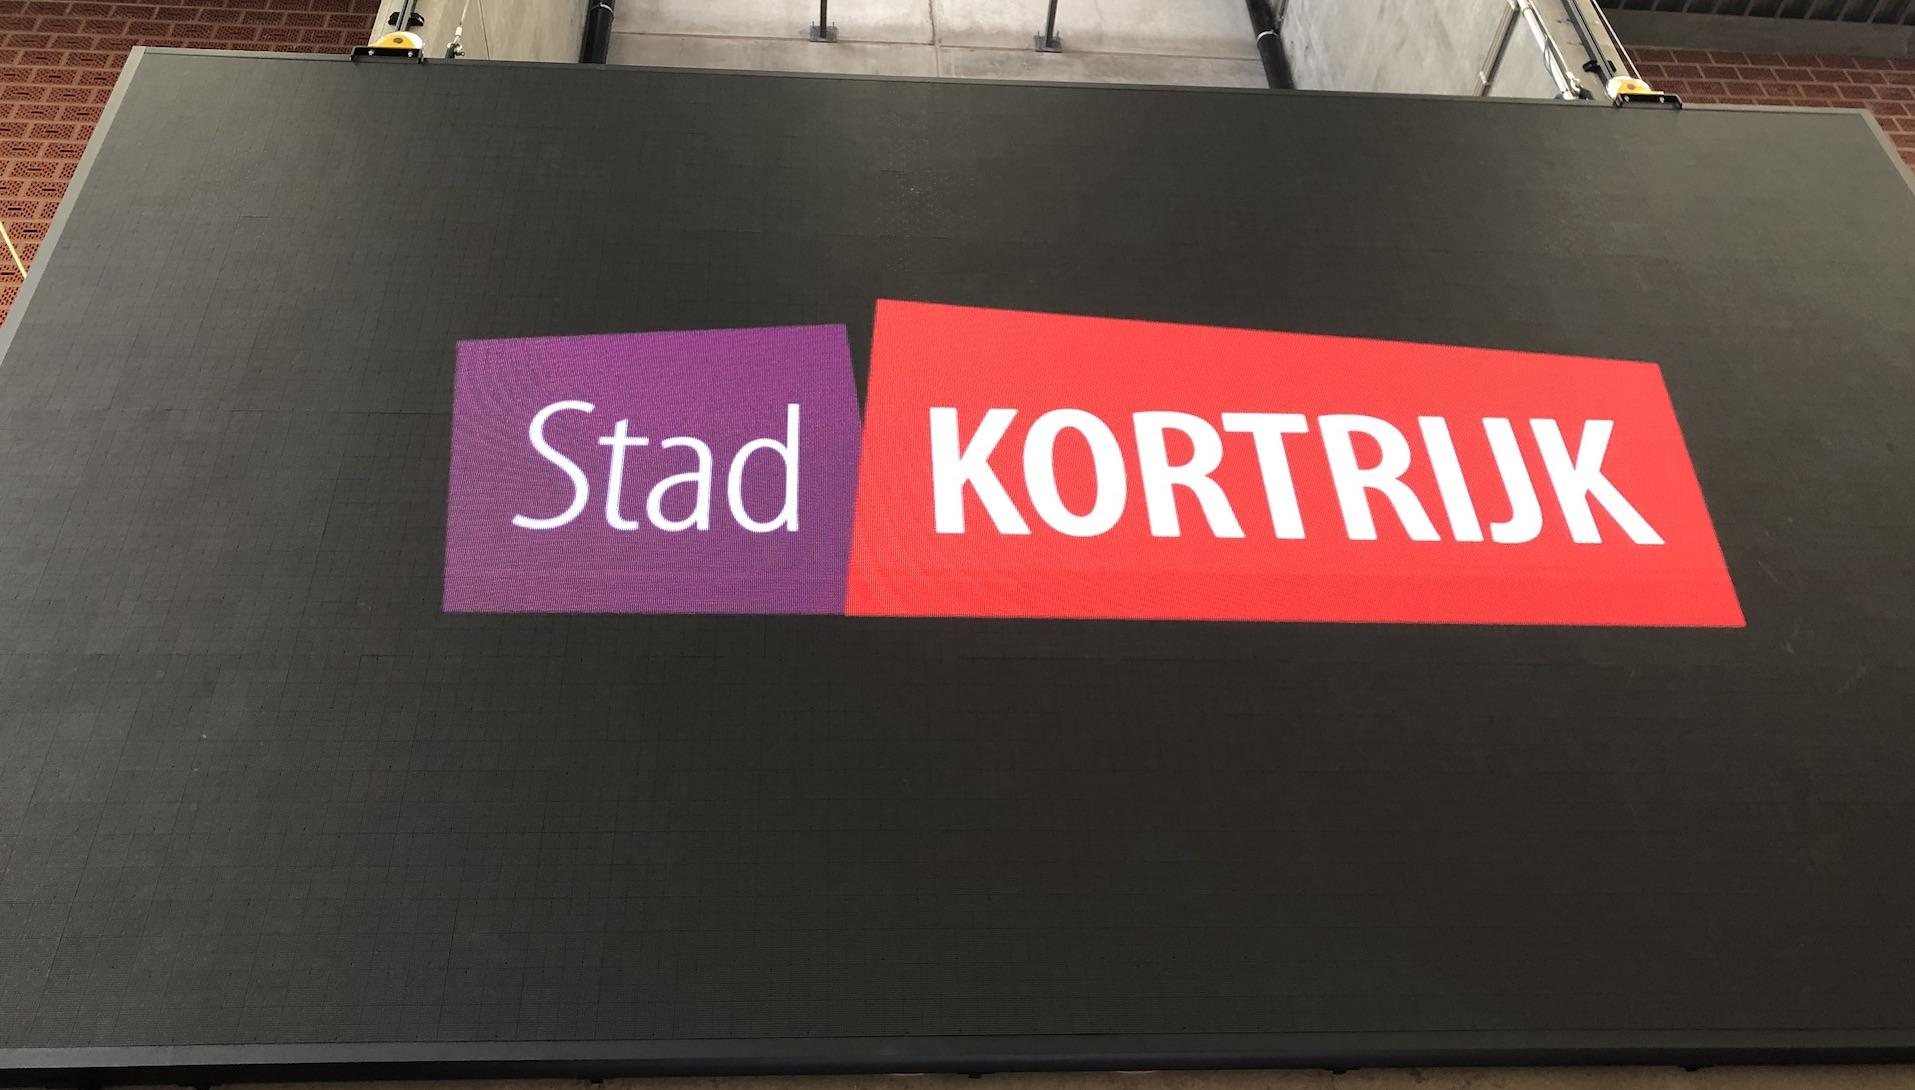 Kortrijk - LED screen - Lange Munte